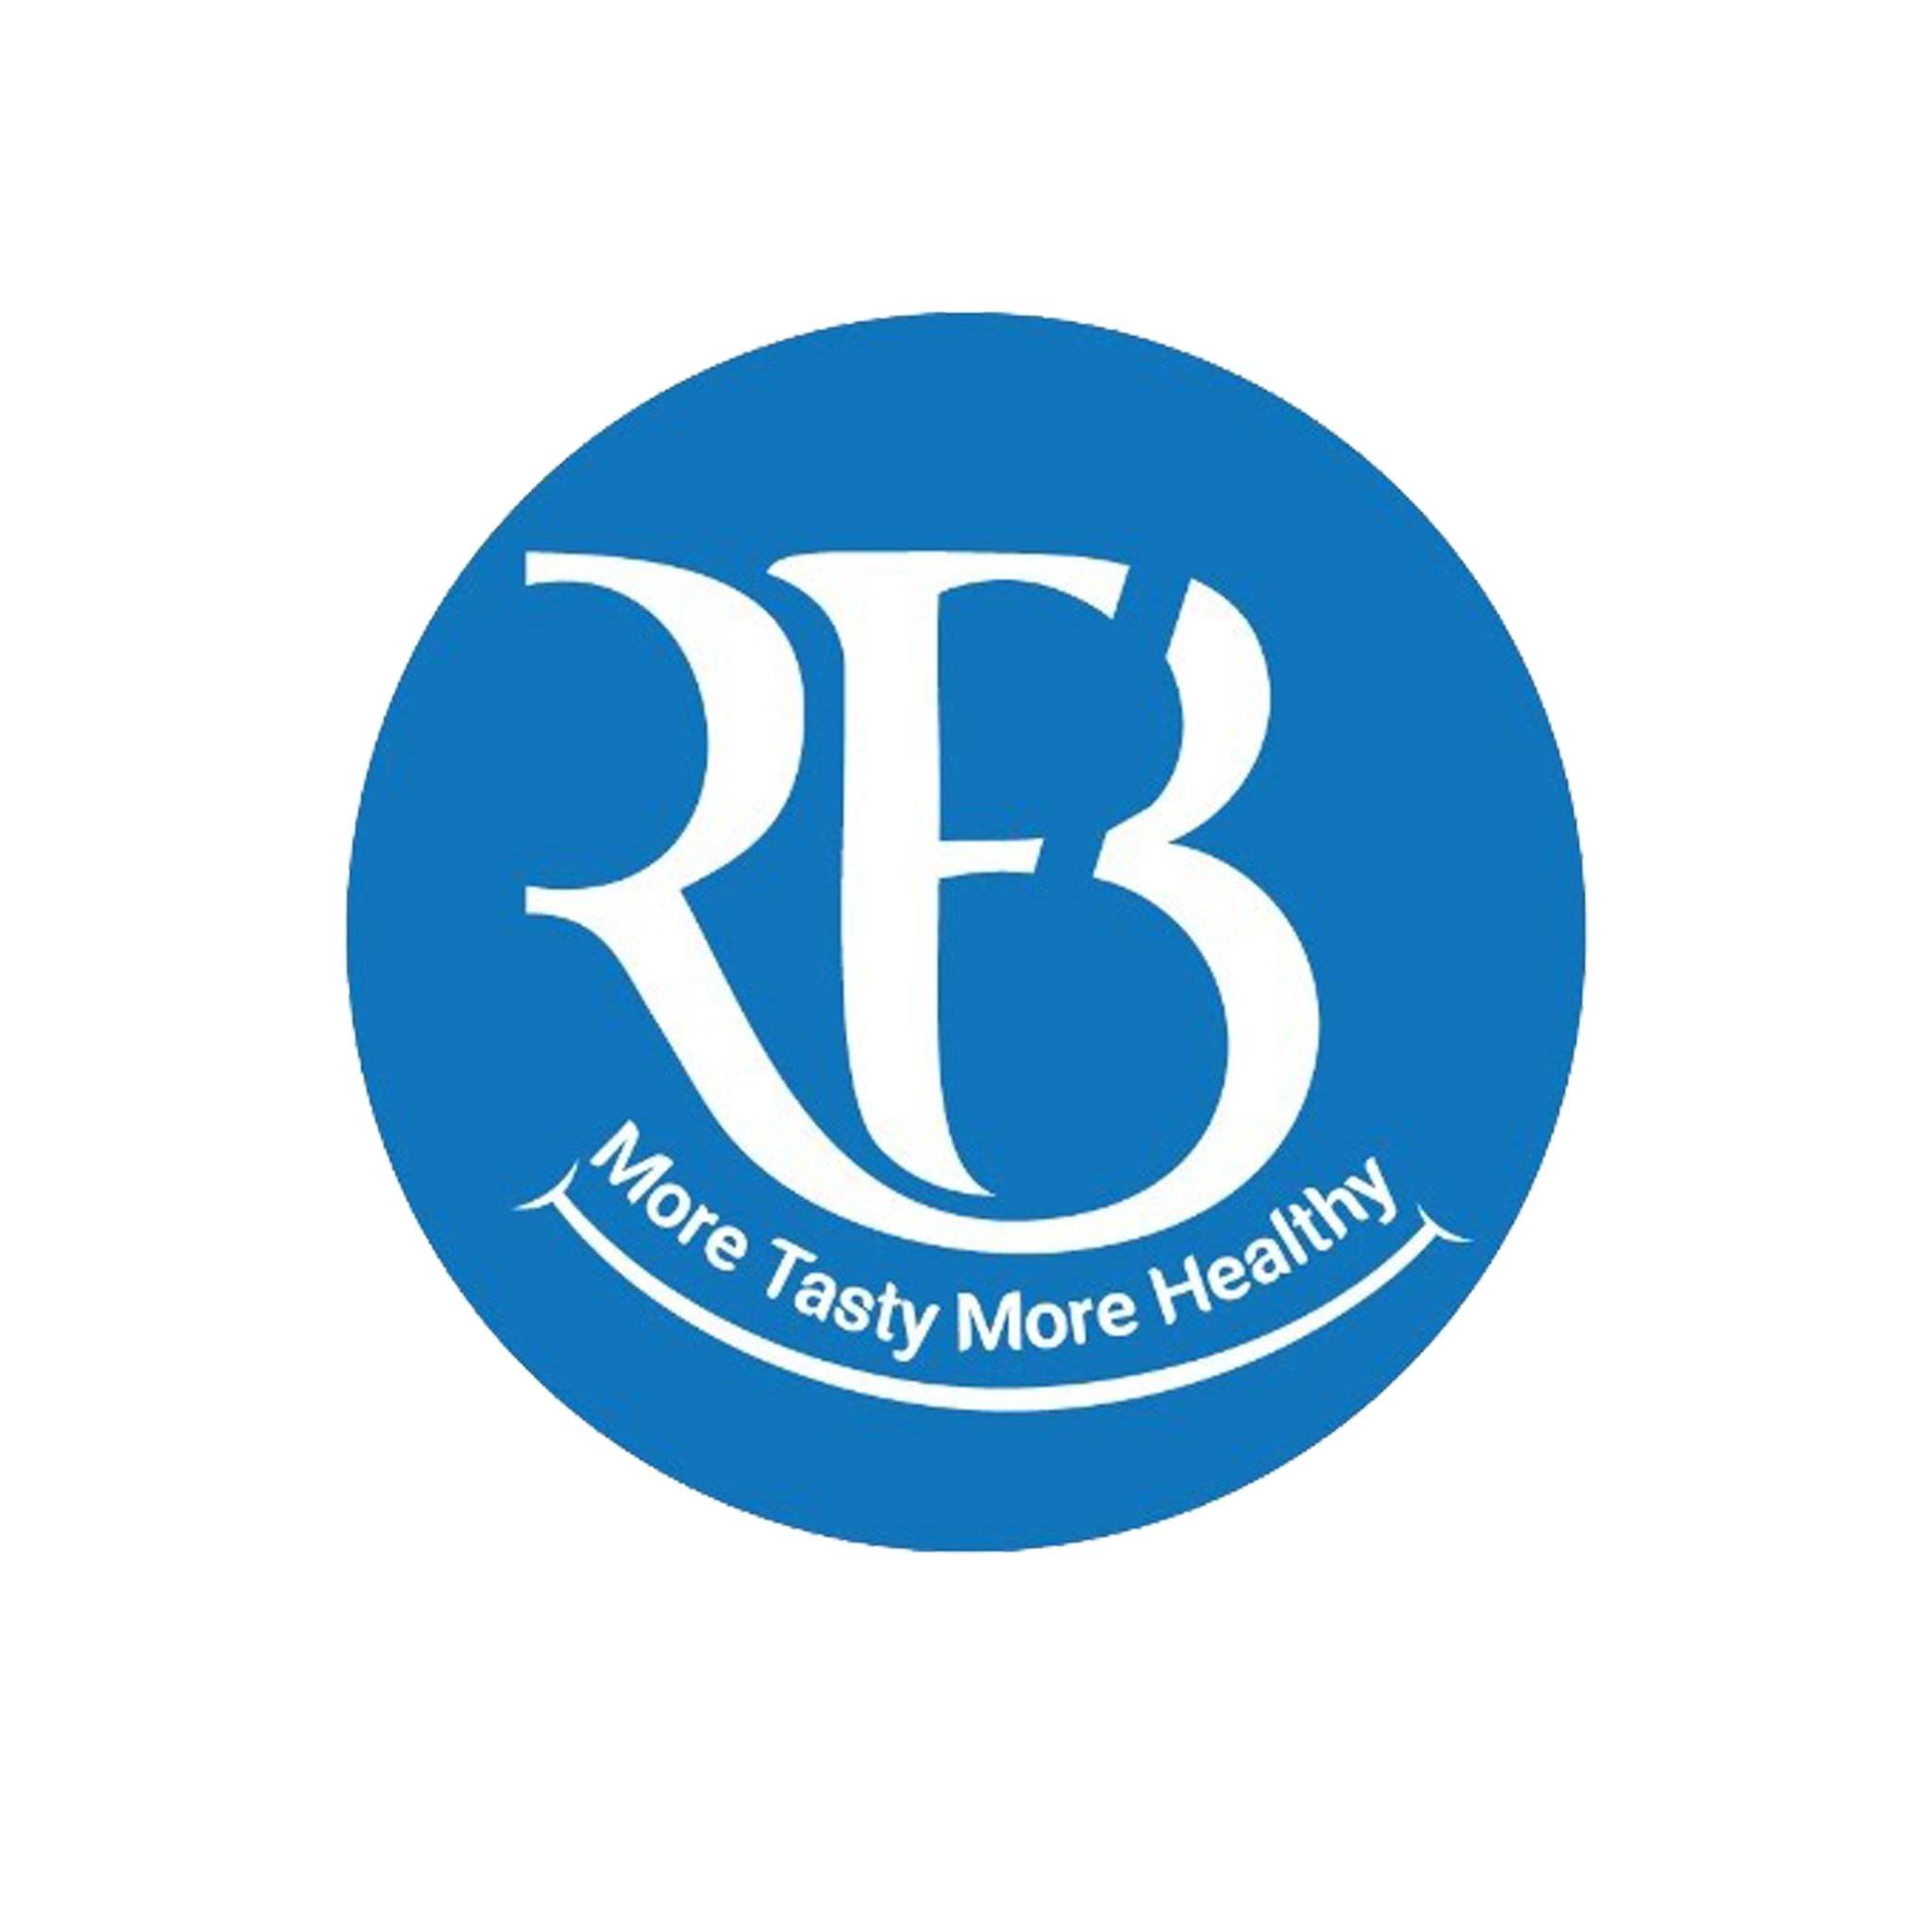 Reliable Foods & Beverage Pvt. Ltd